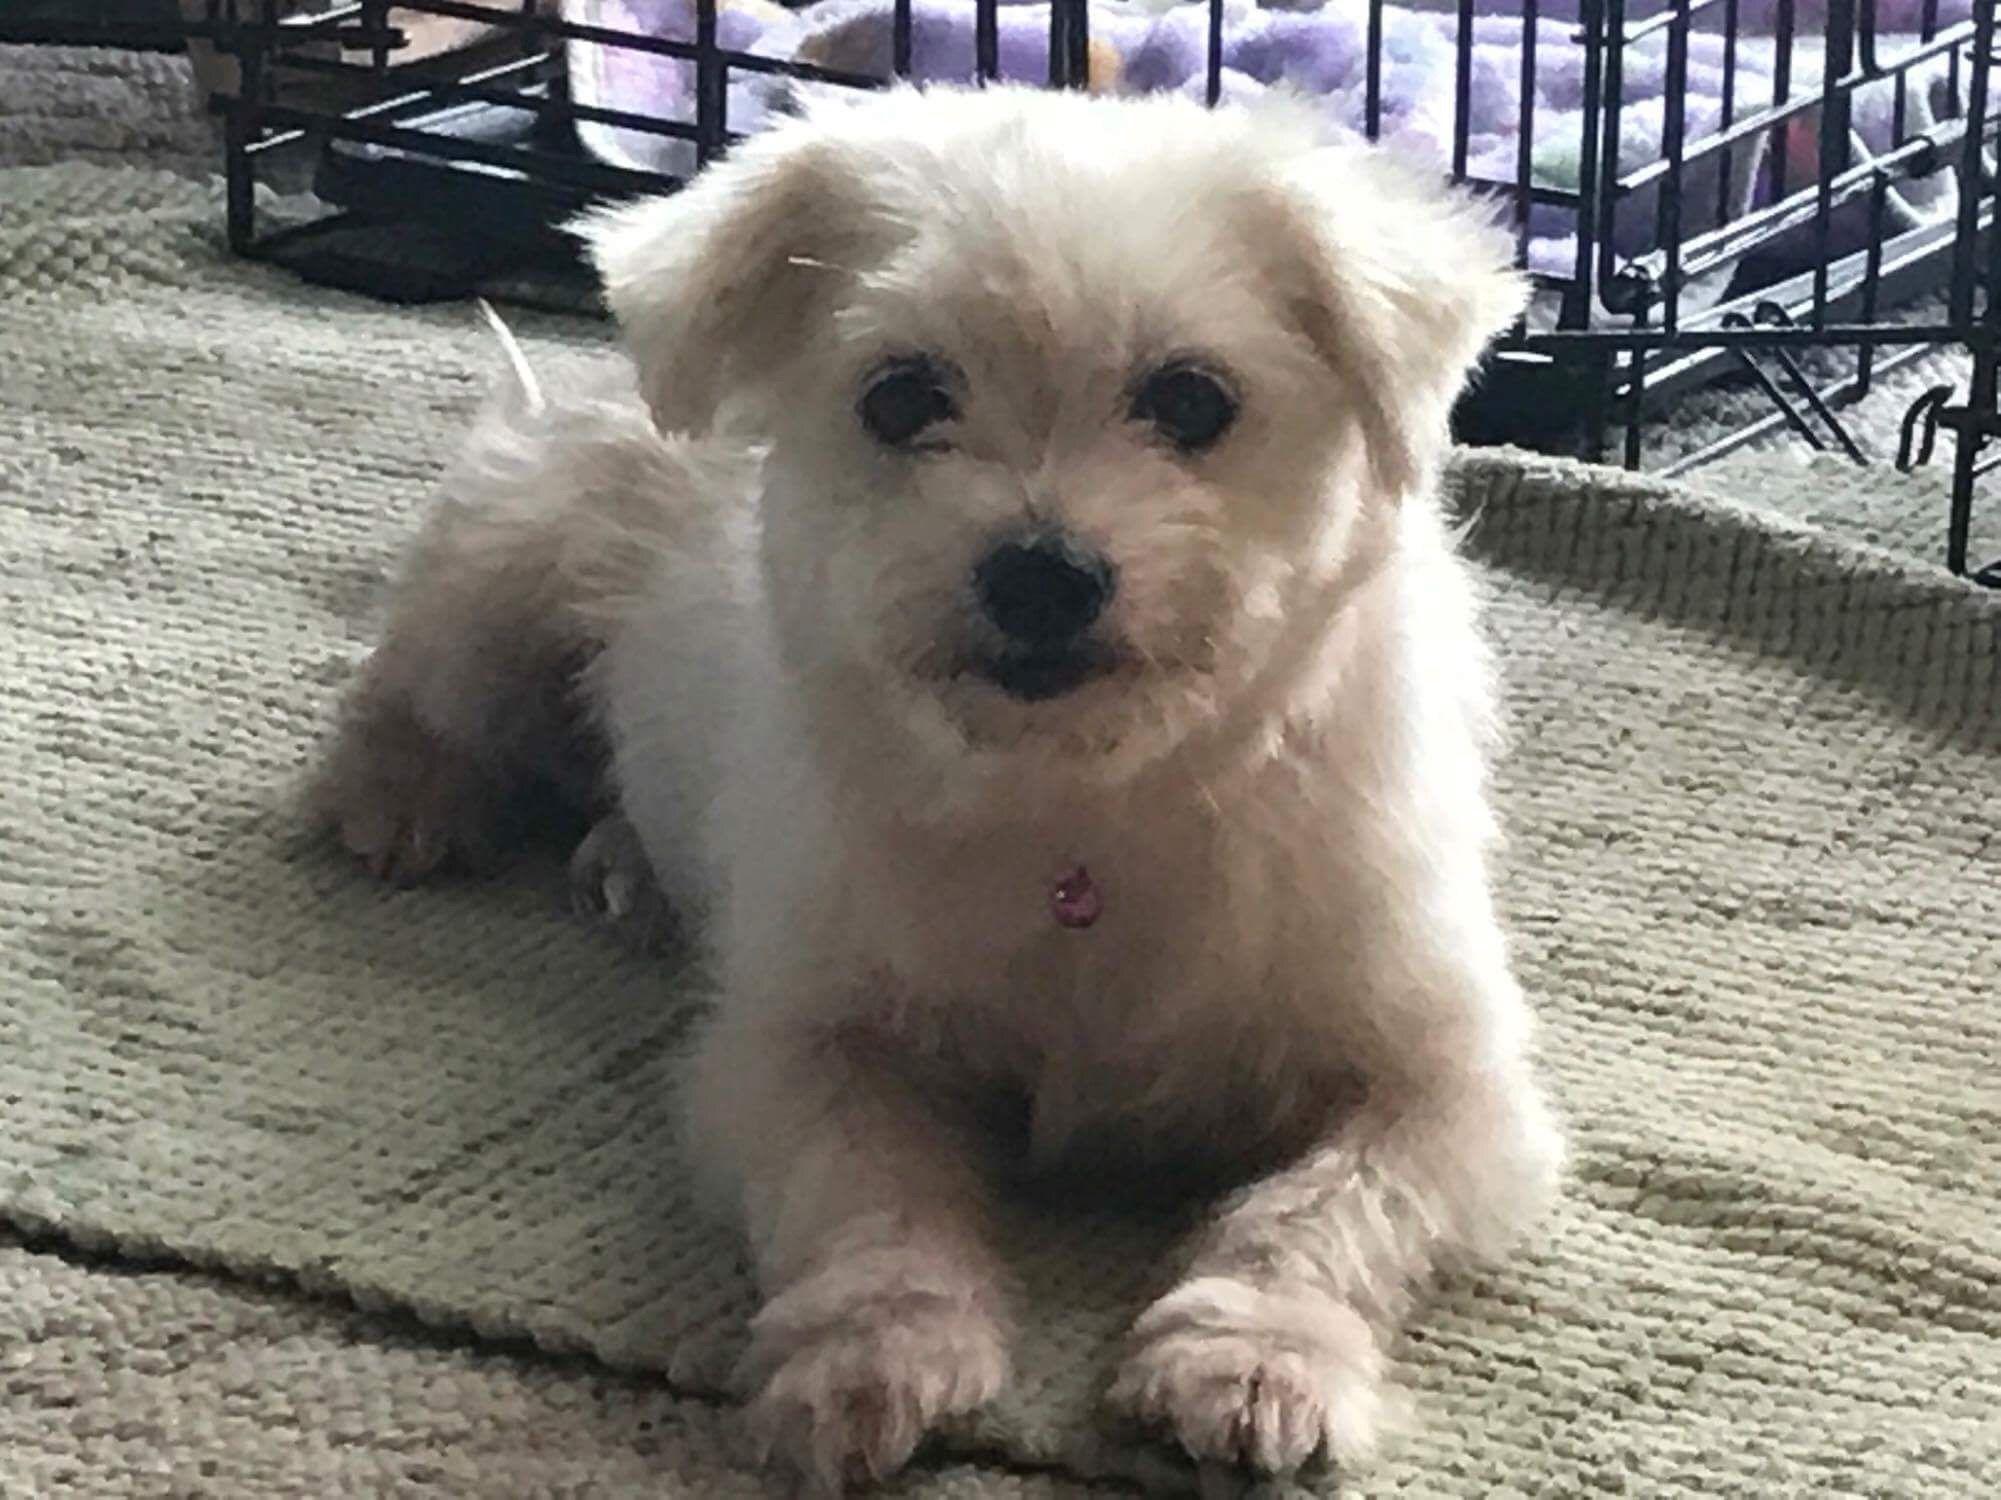 Maltese dog for Adoption in Buffalo, NY. ADN675568 on